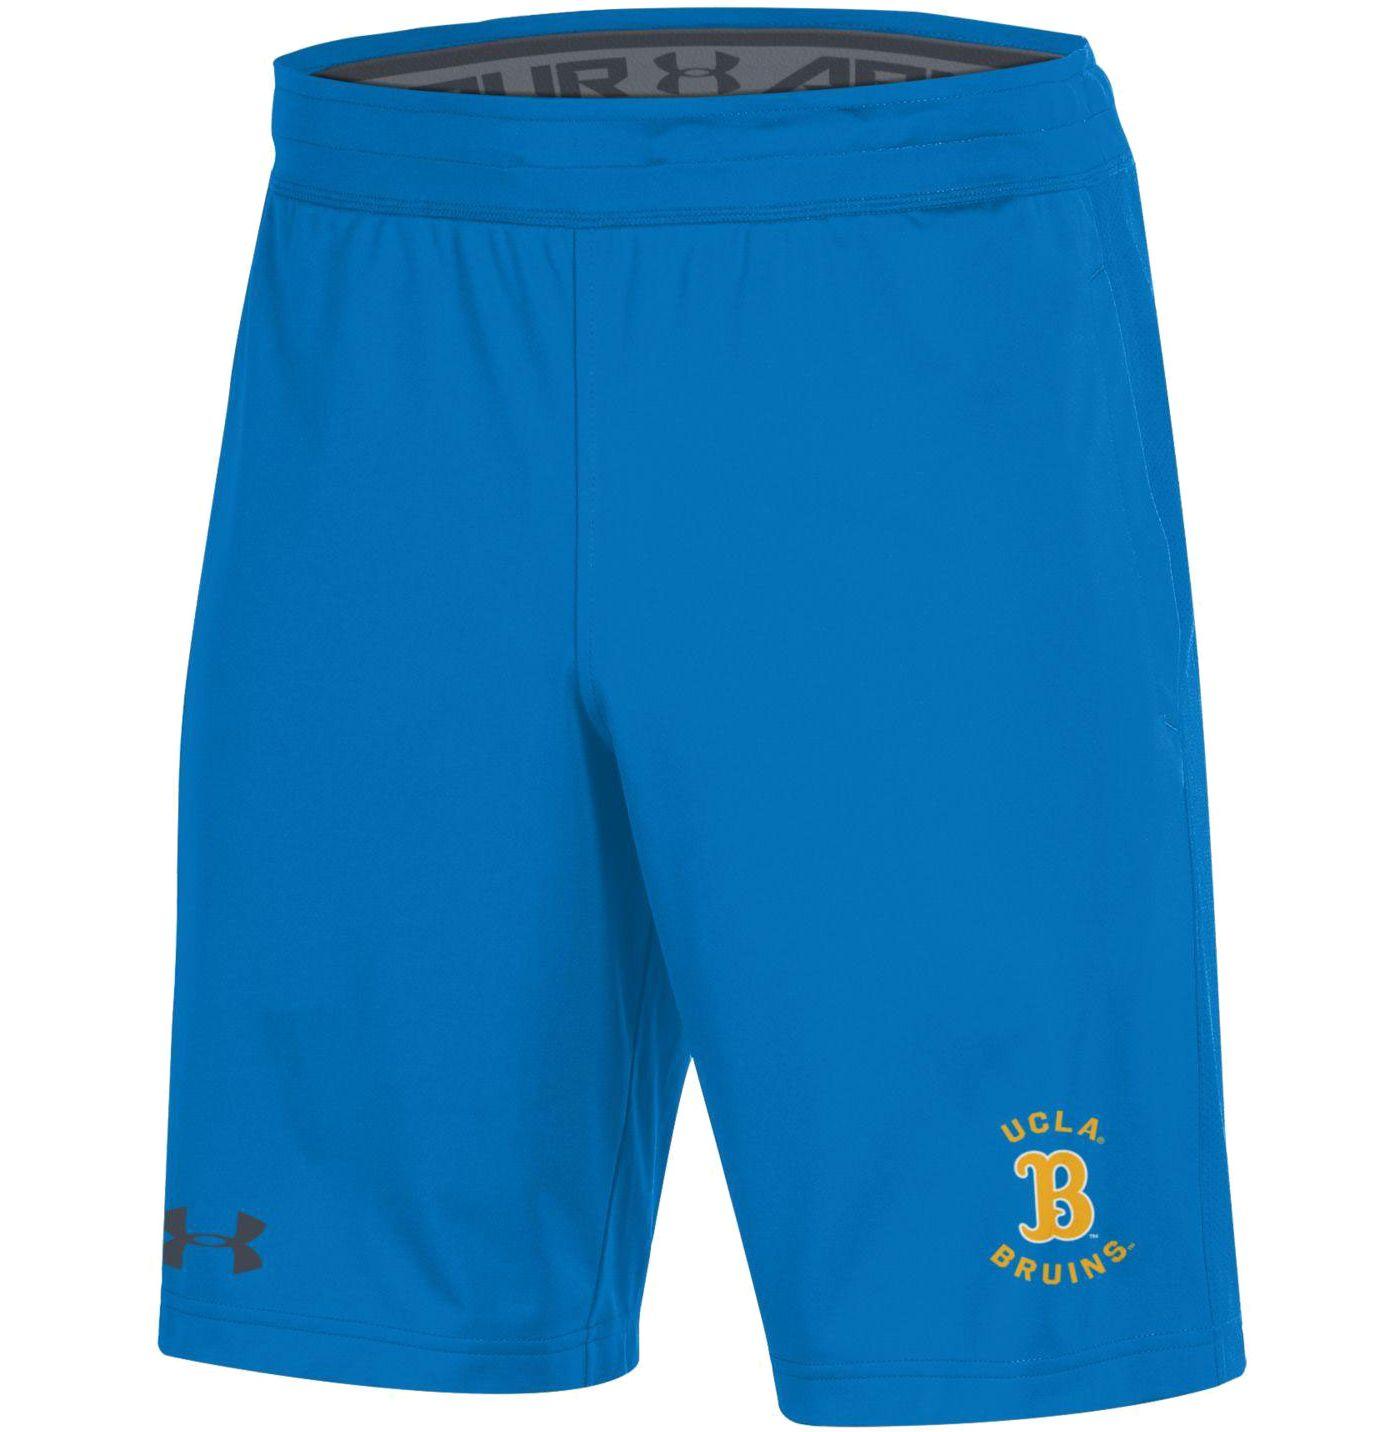 Under Armour Men's UCLA Bruins True Blue Raid Performance Shorts